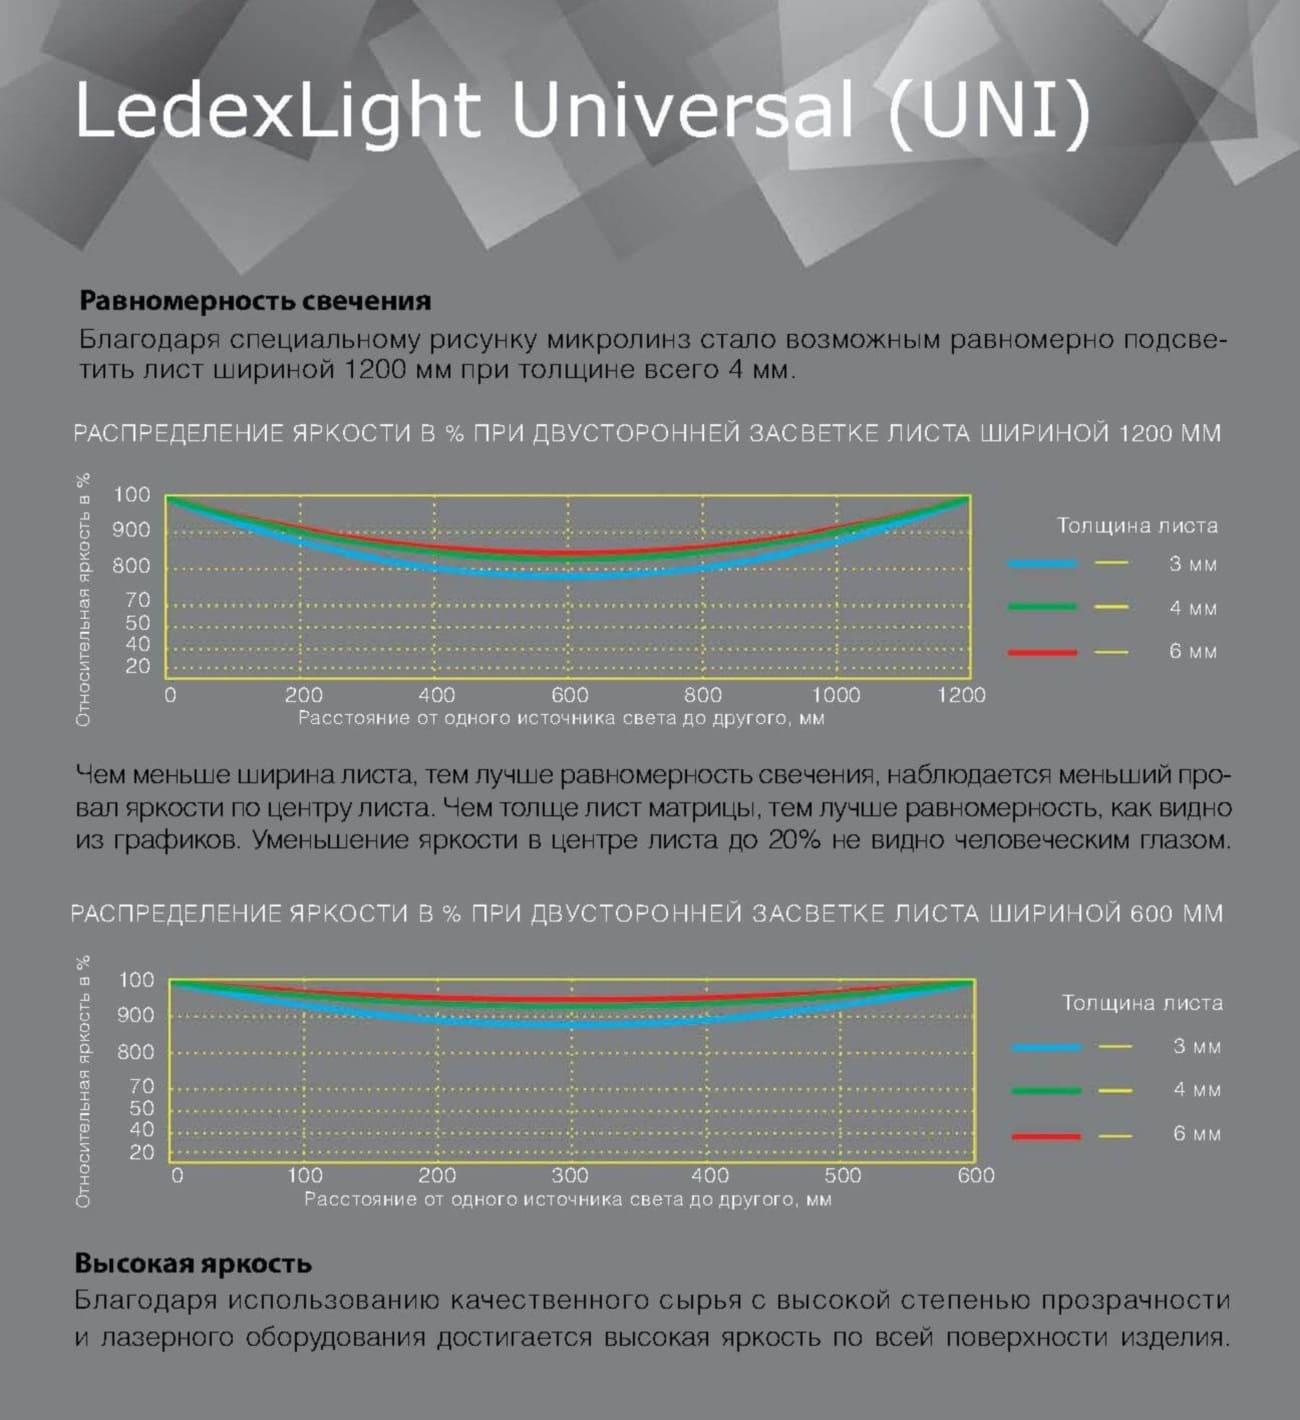 Ledexlight Universal